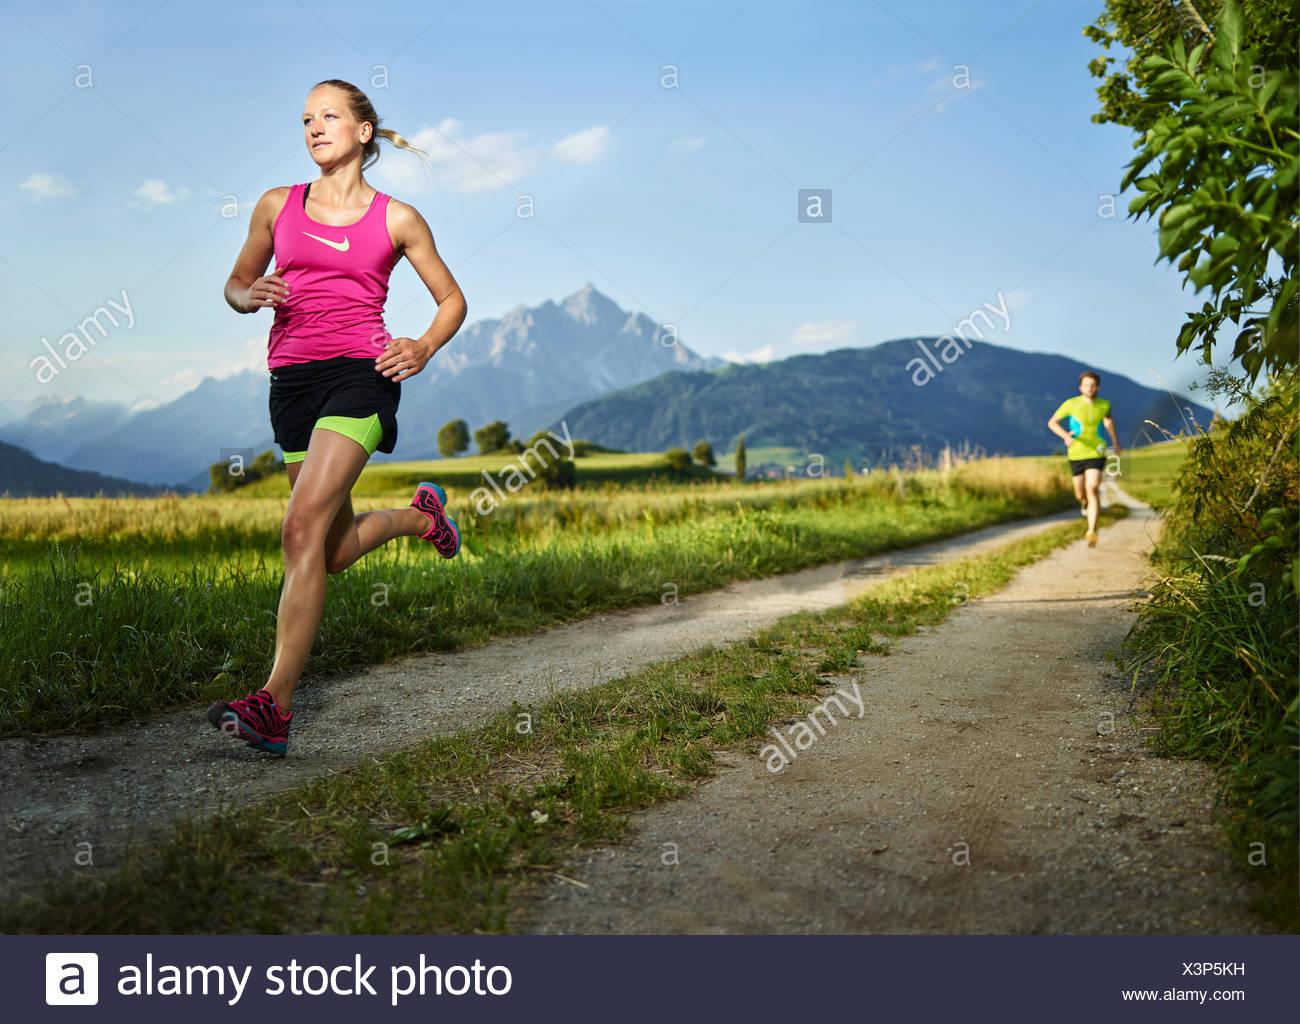 Young woman in her twenties running on path through fields, Rosengarten, Tyrol, Austria - Stock Image